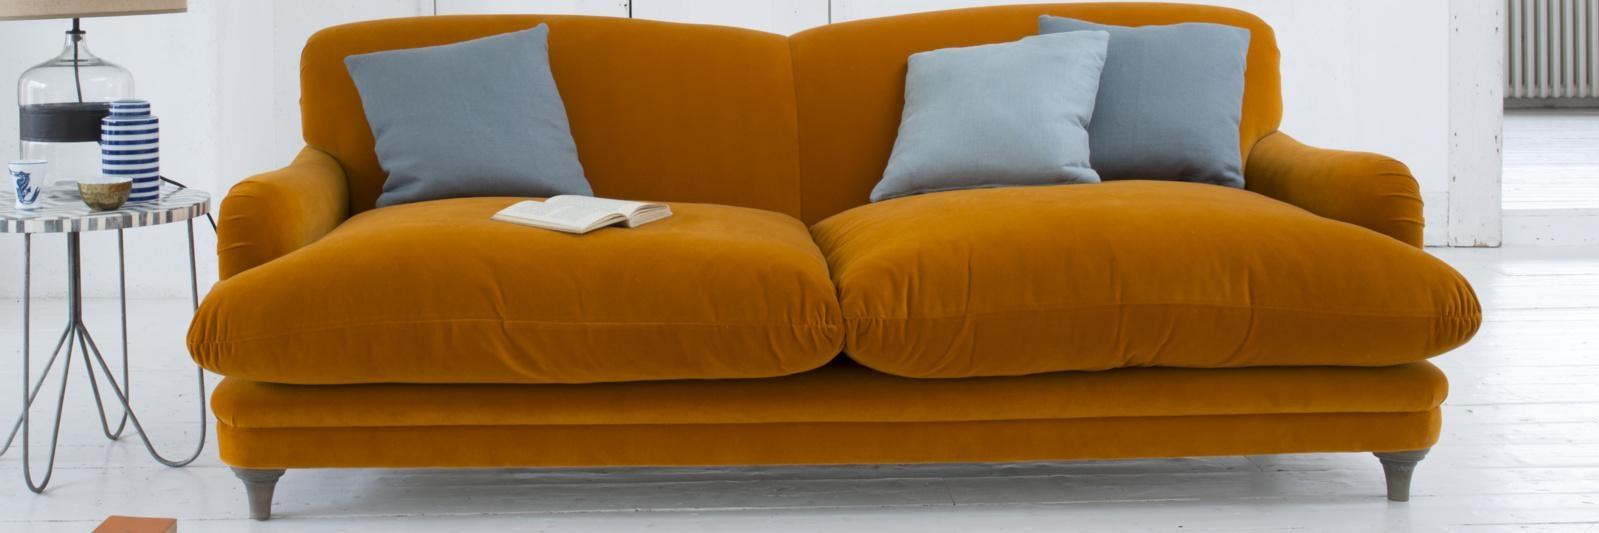 Orange Sofas – Home Design Ideas And Pictures For Burnt Orange Sofas (View 18 of 20)